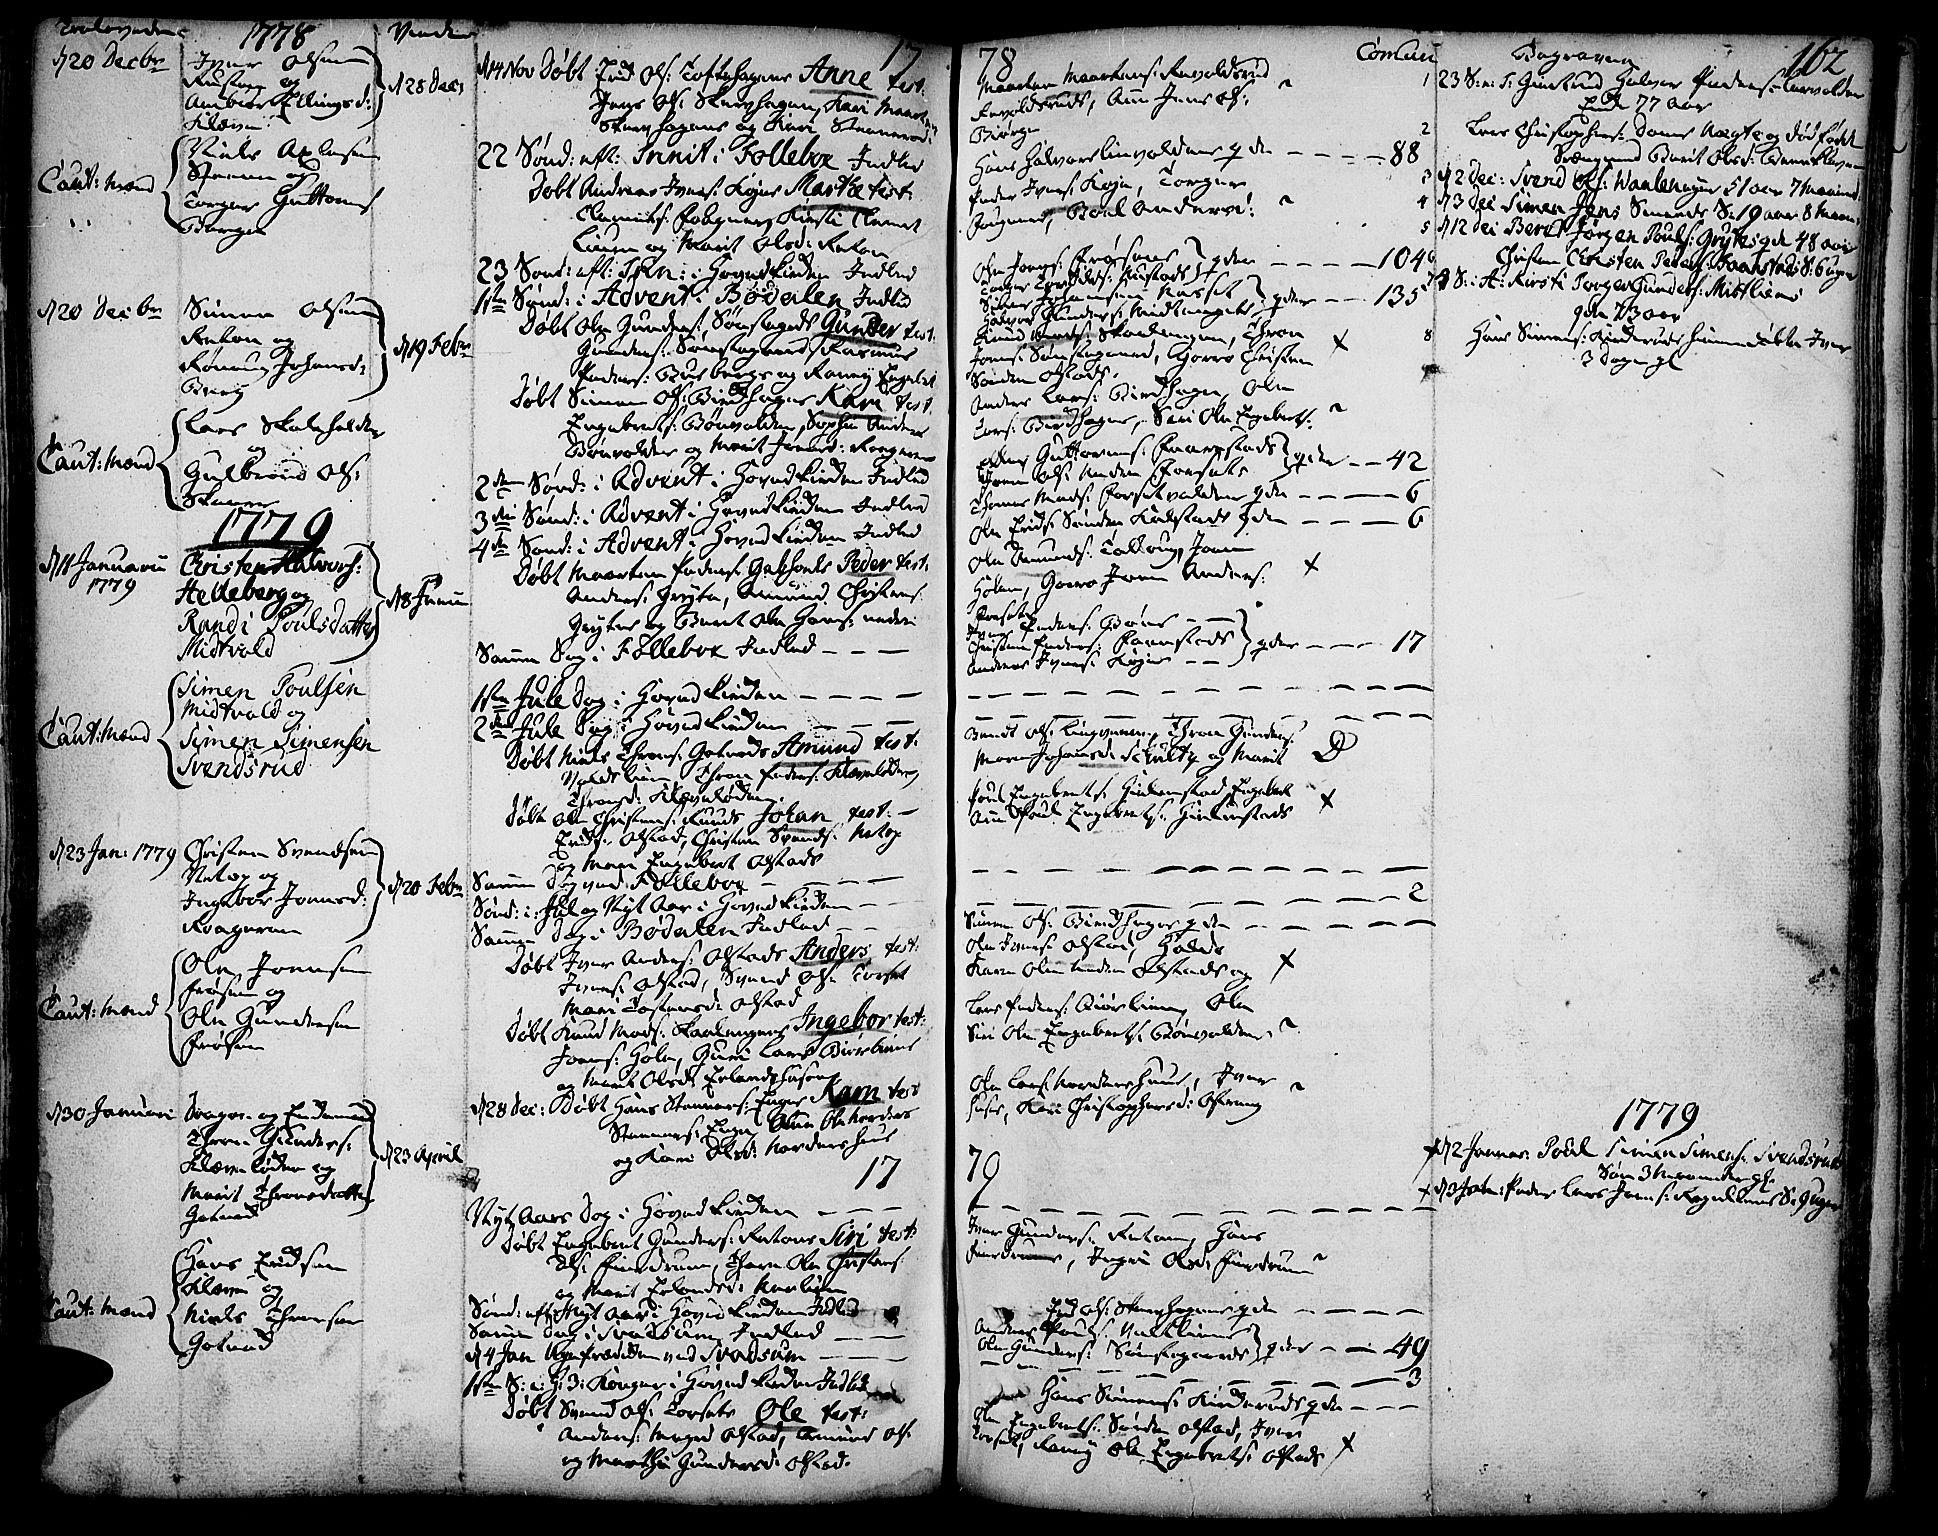 SAH, Gausdal prestekontor, Ministerialbok nr. 3, 1758-1809, s. 162